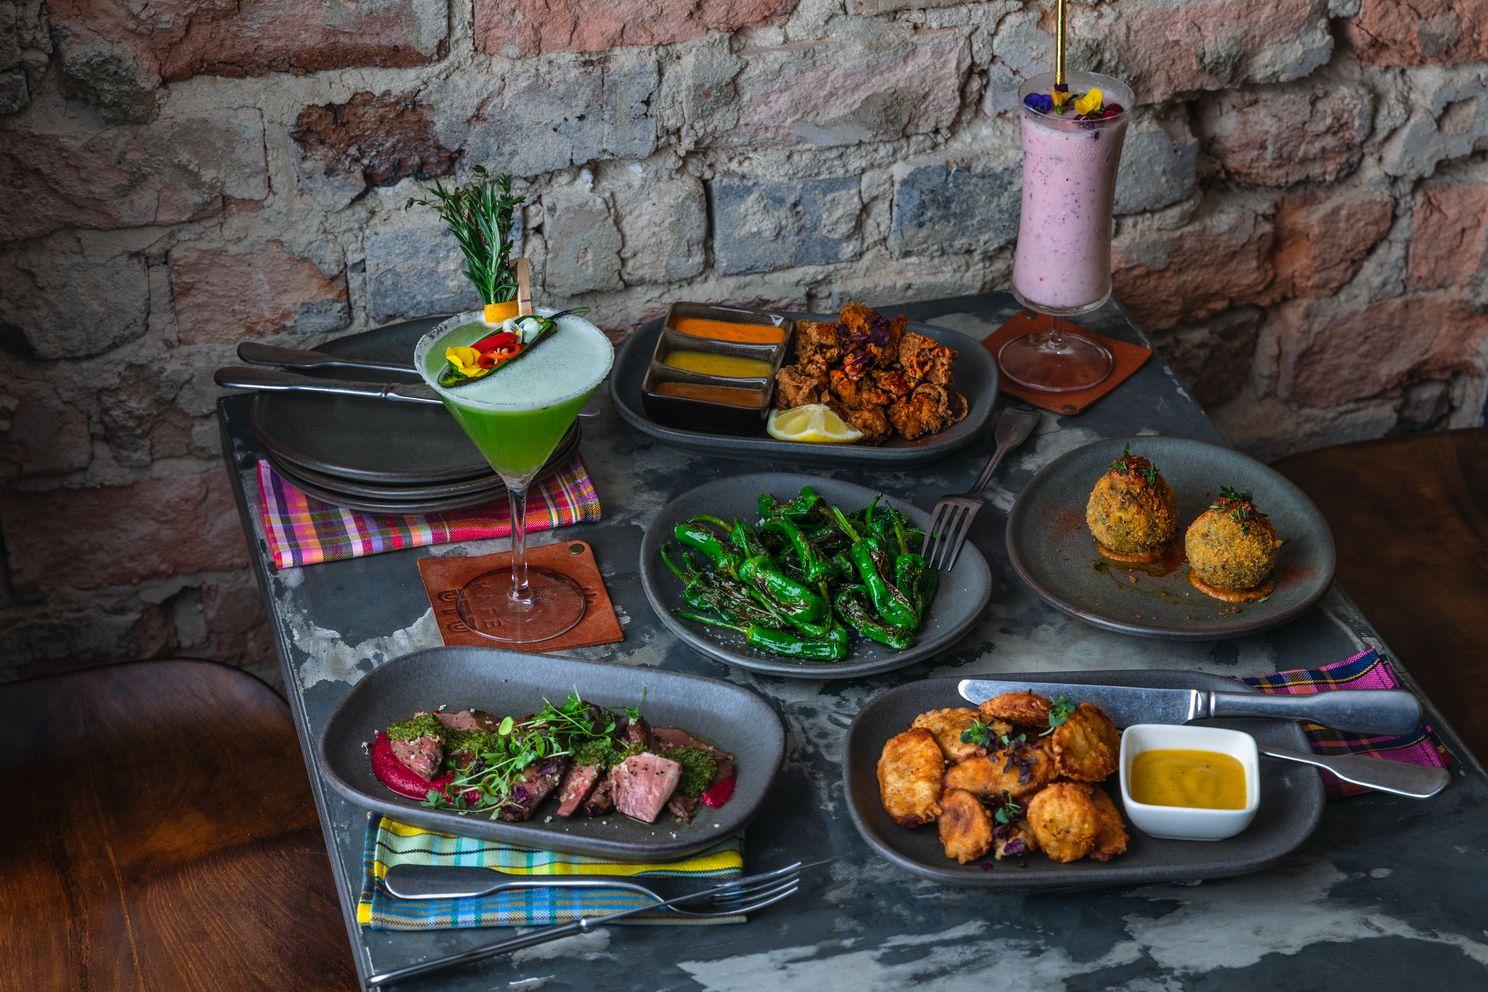 Kafe Utu: Image of the food